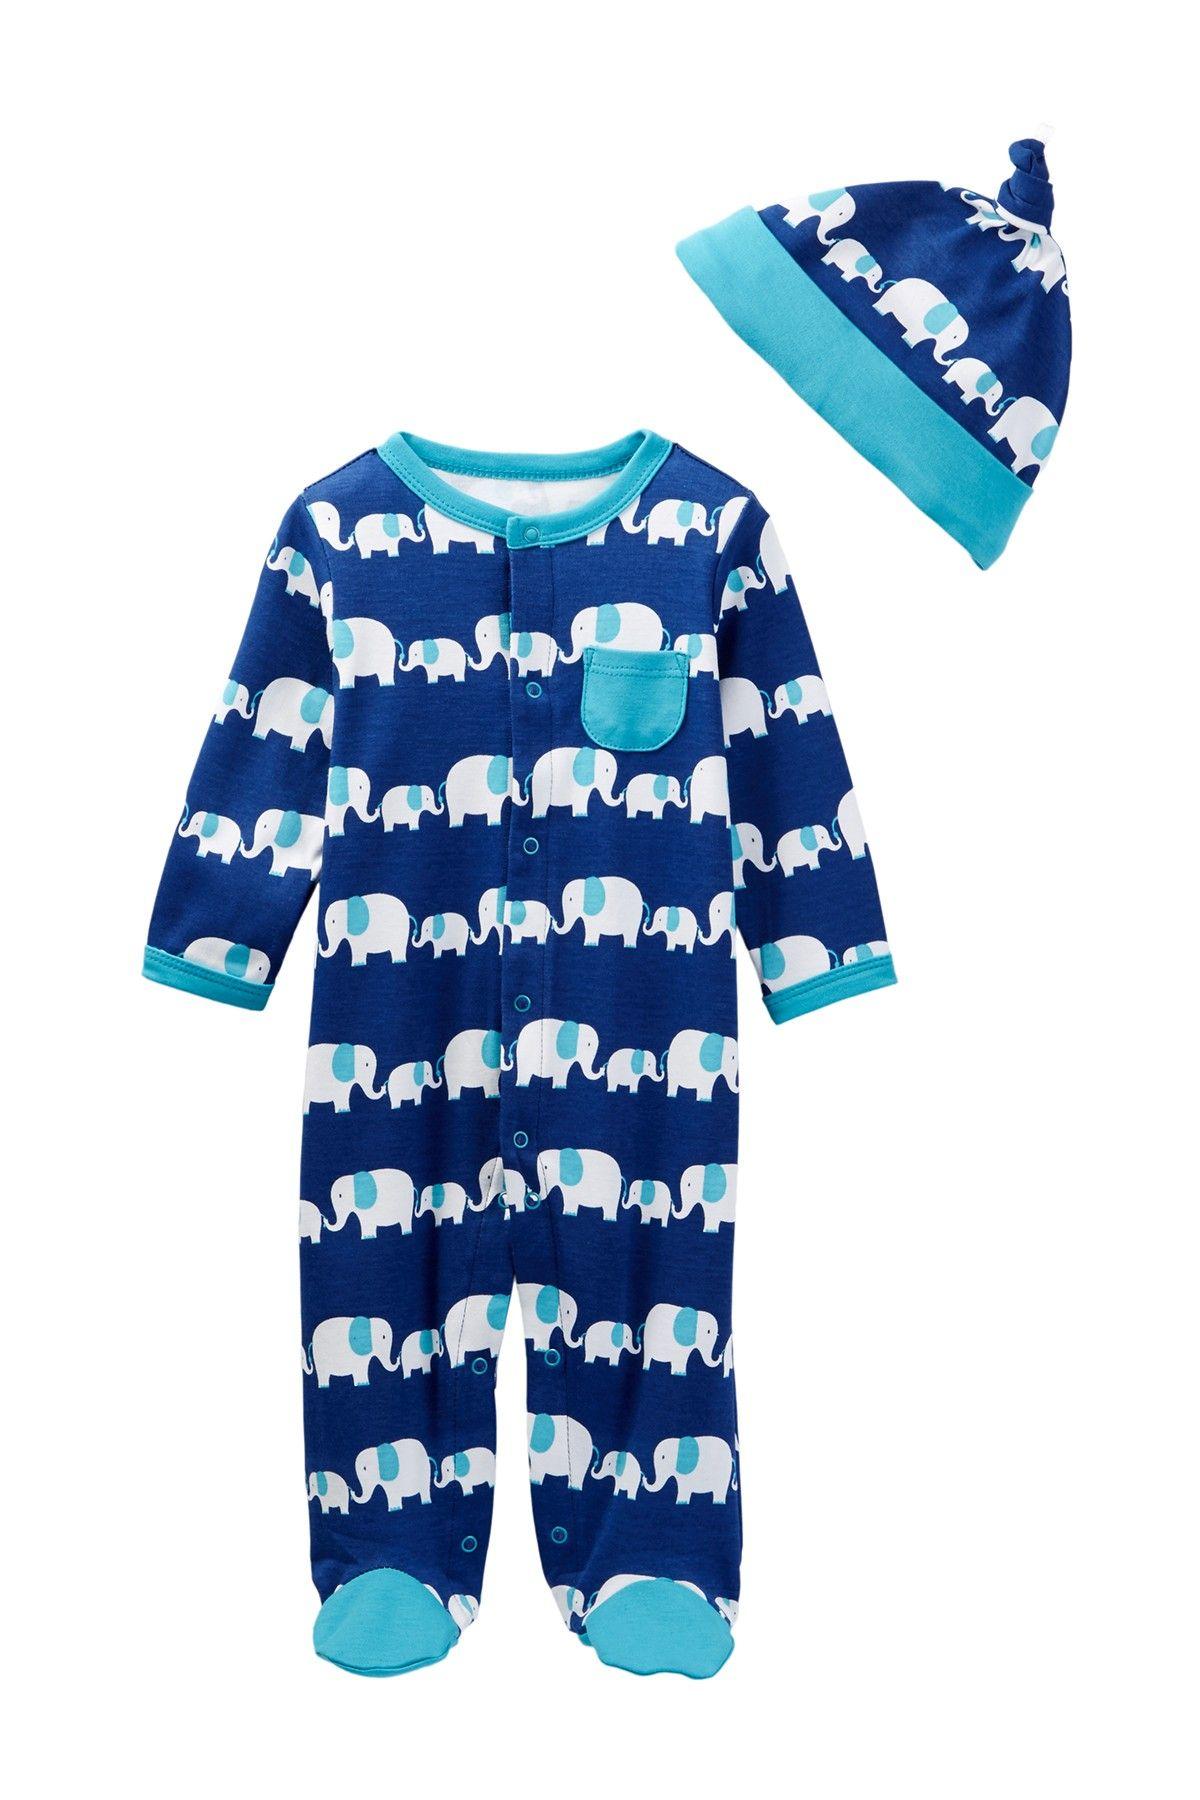 Elephant Footie Akid Styles Pinterest